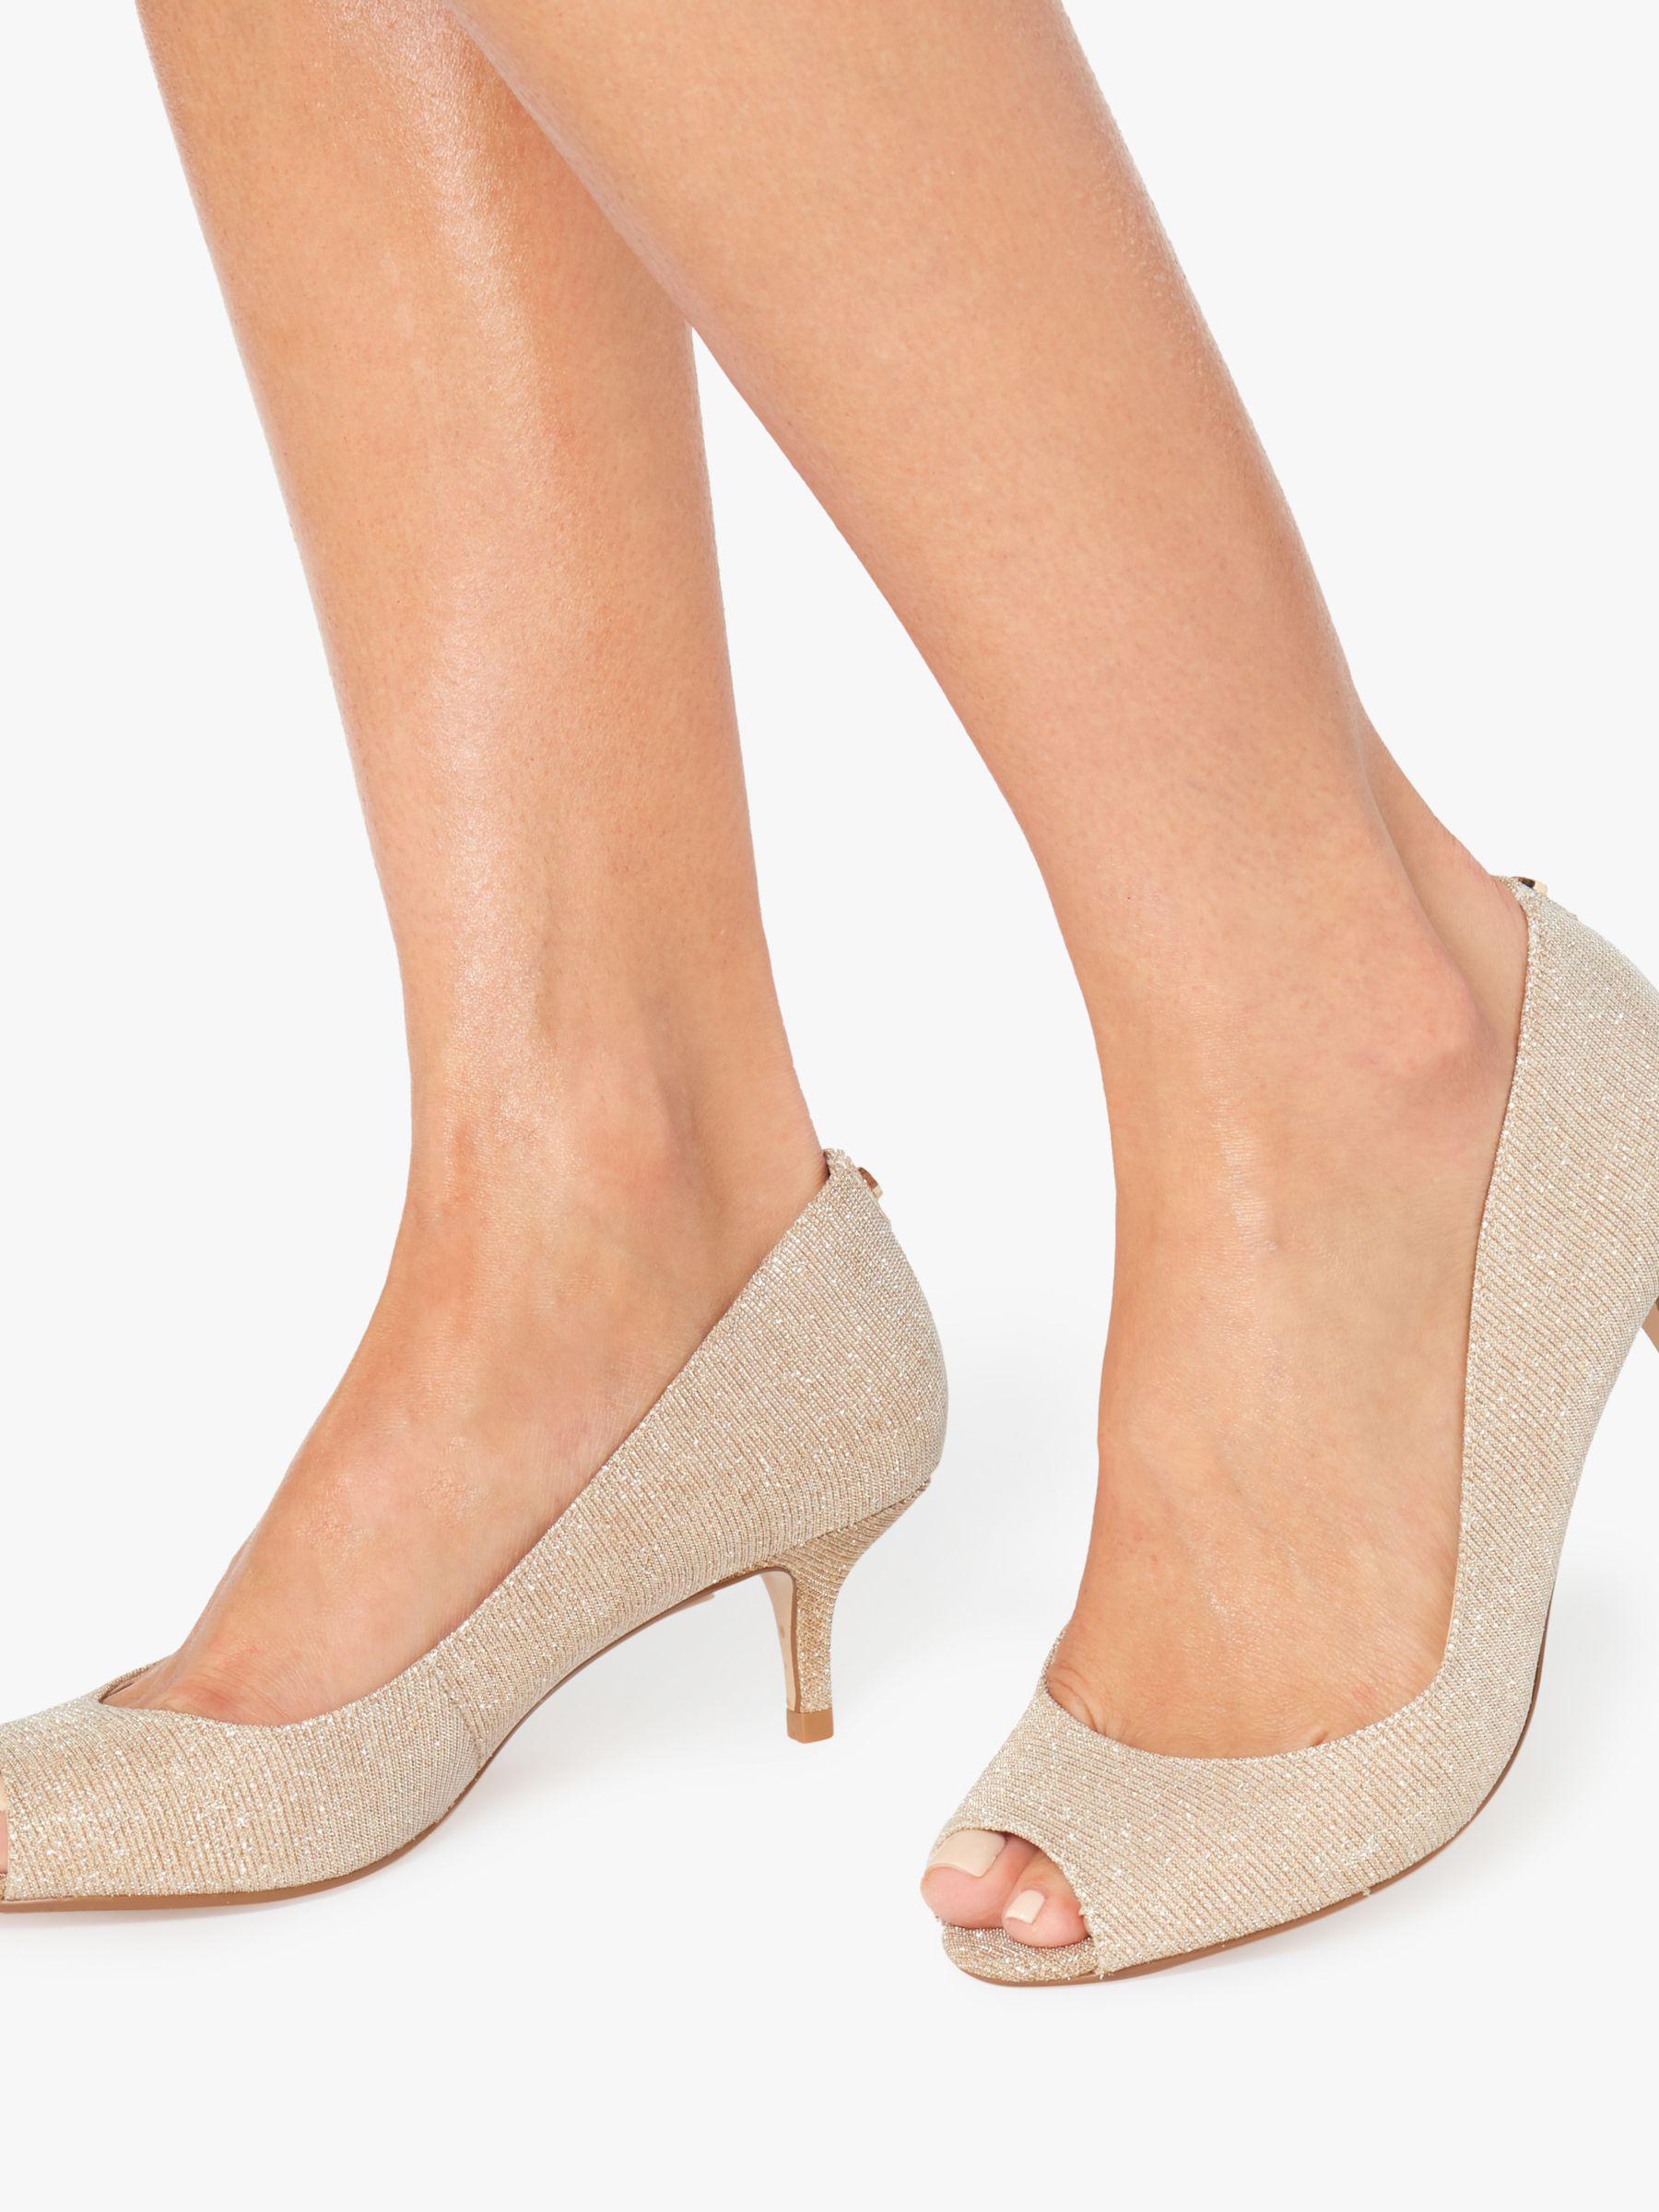 dbb8739b2e Dune Cherrie Peep Toe Kitten Heel Sandals in Metallic - Lyst